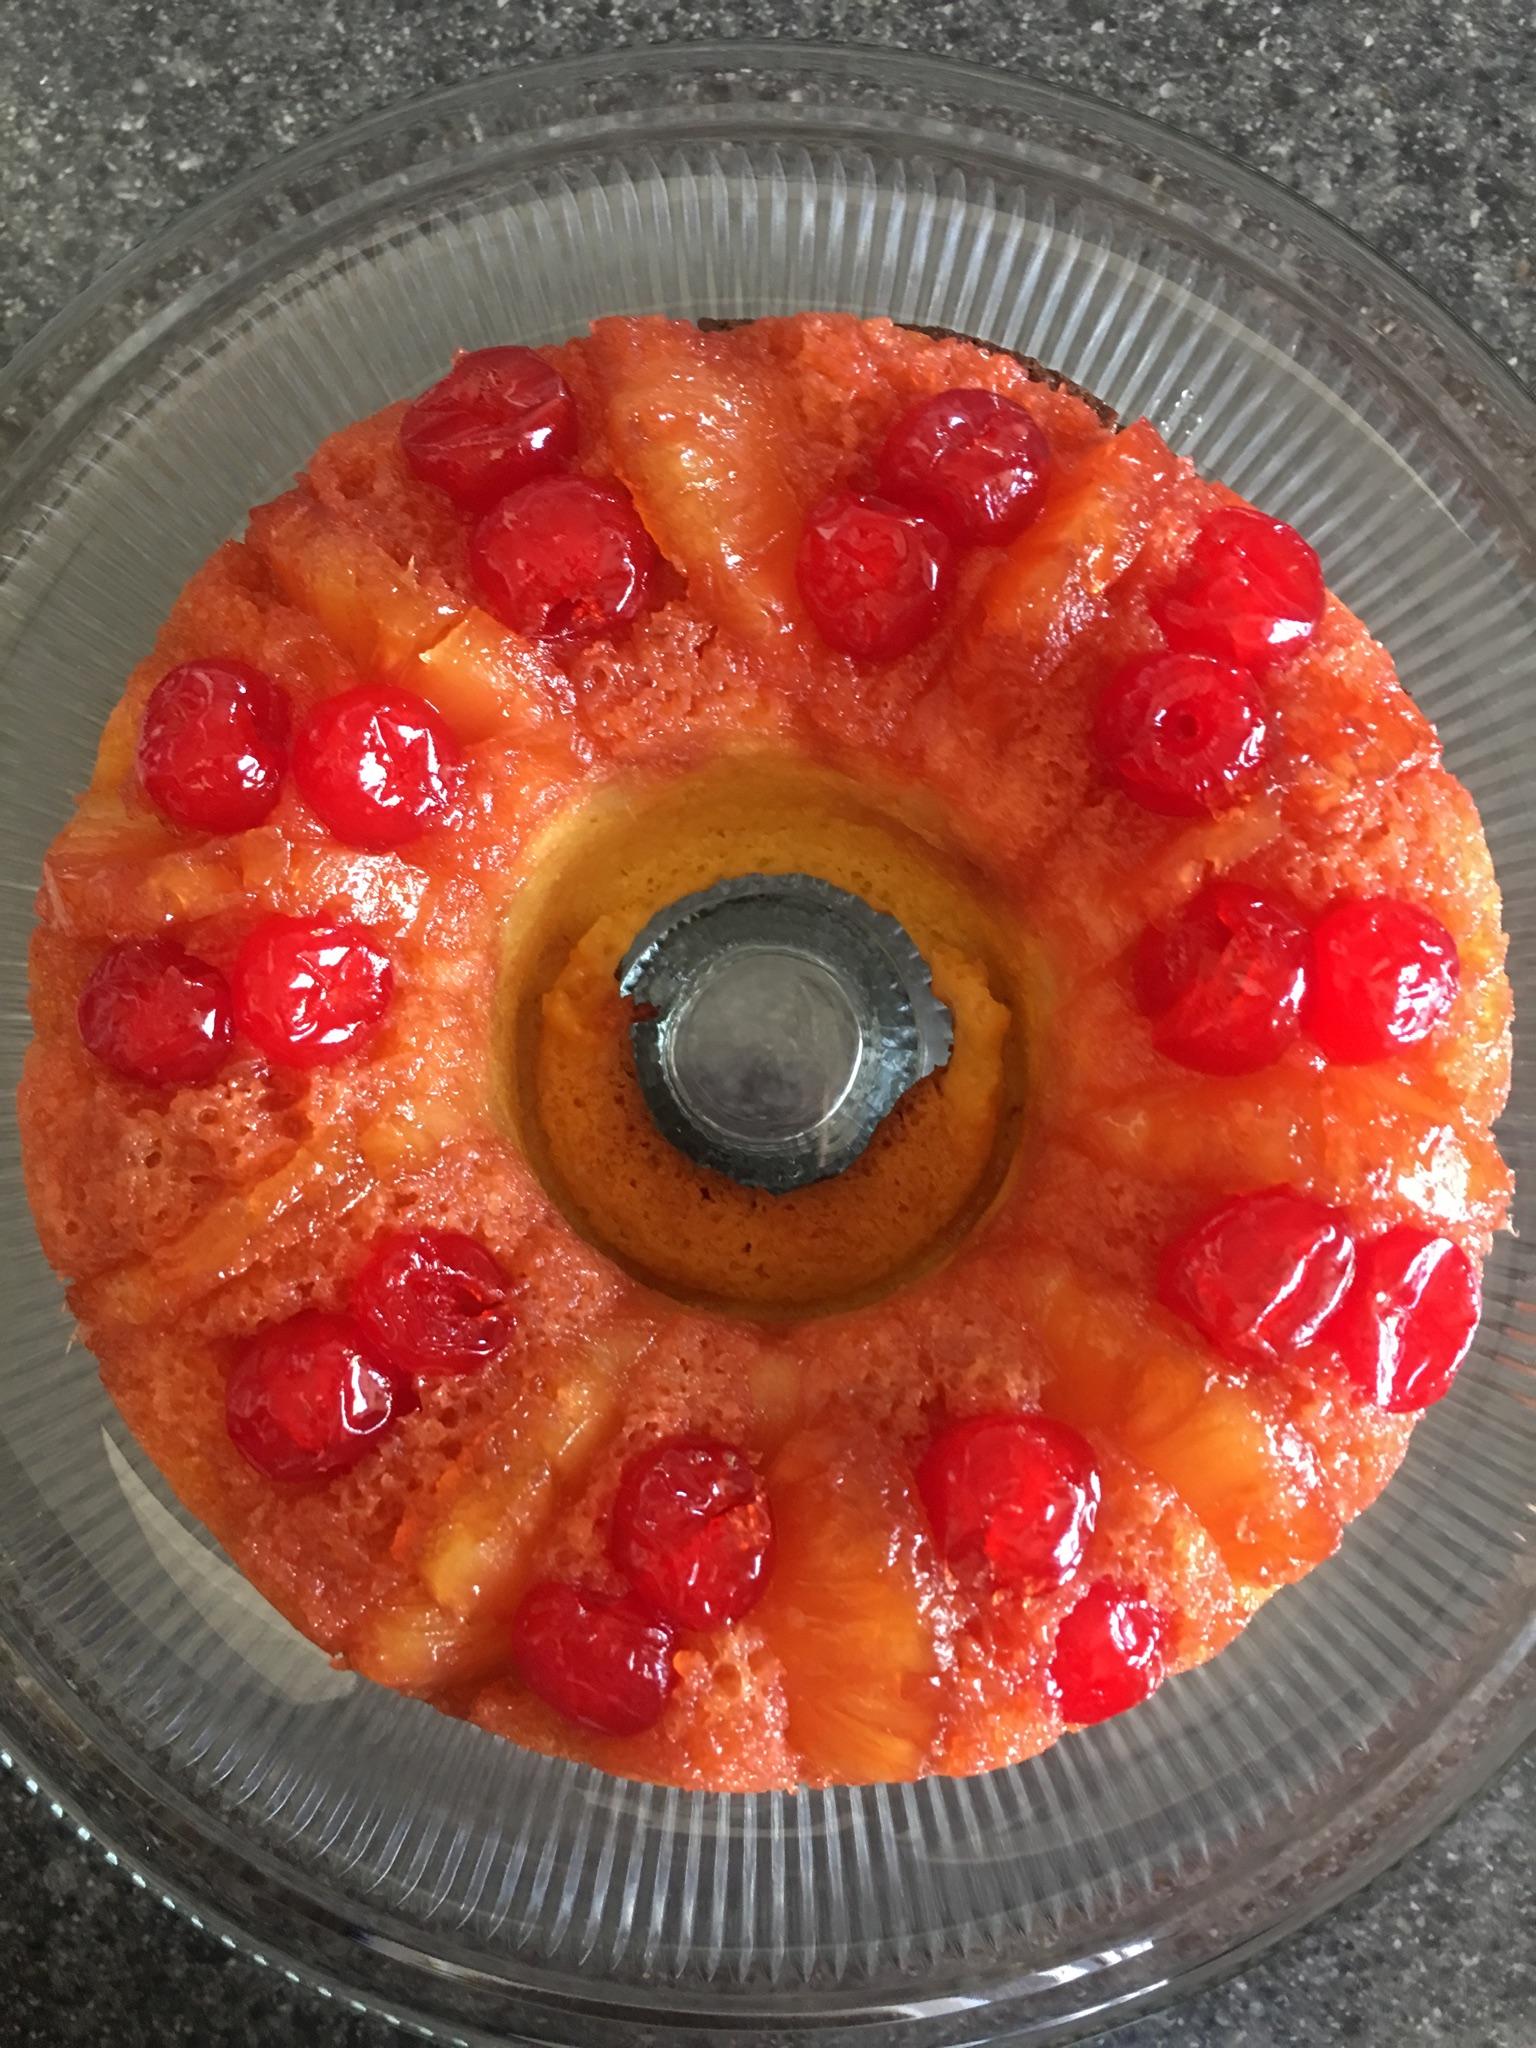 Pineapple Upside-Down Bundt® Cake